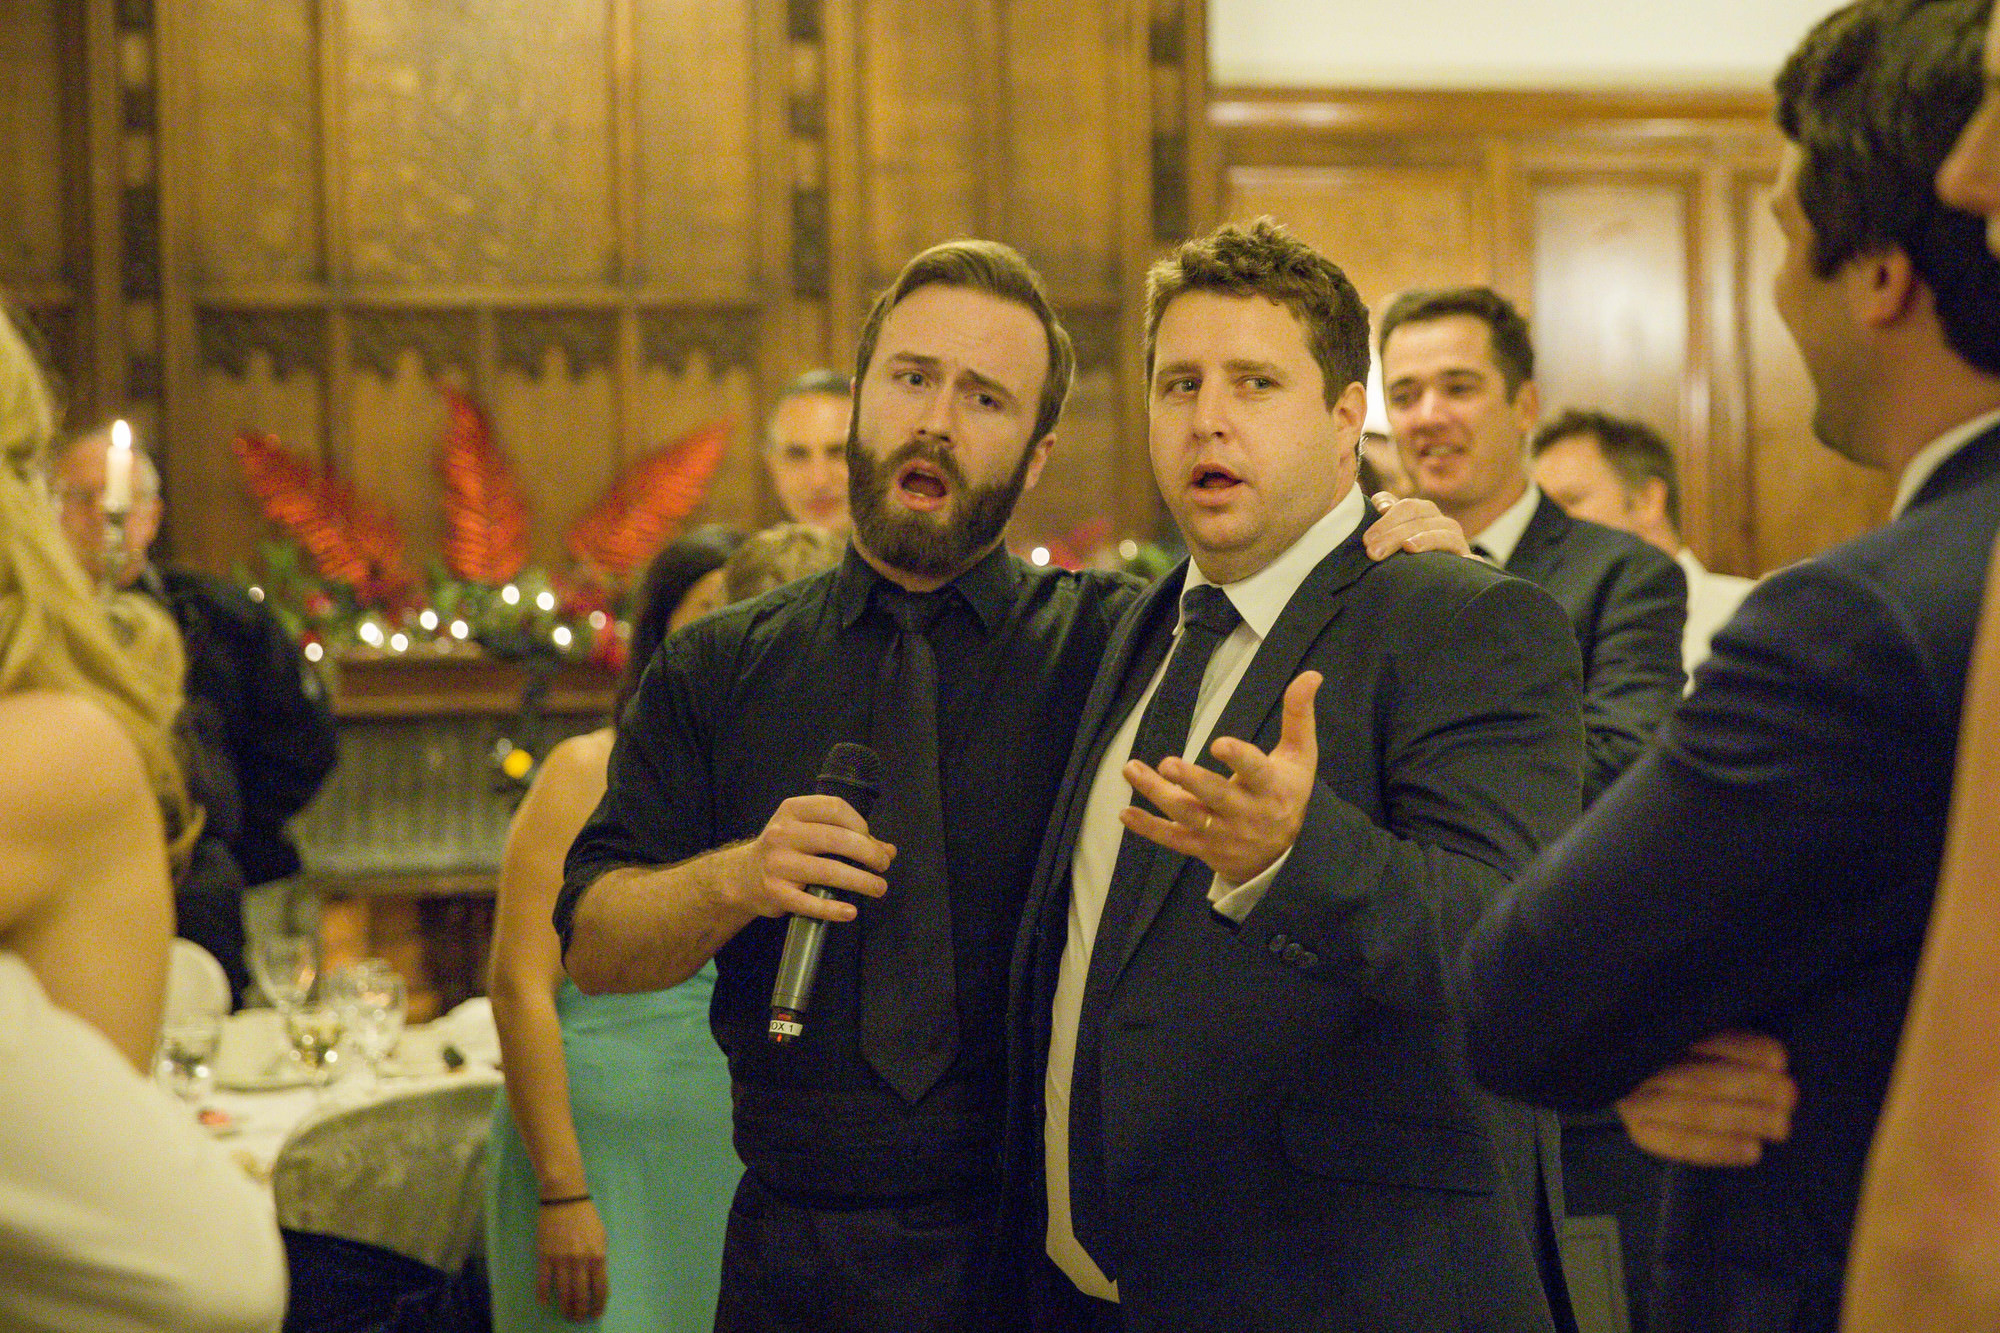 muckross_park_hotel_grougane_barra_wedding_photographer_goldenmoments_078.jpg